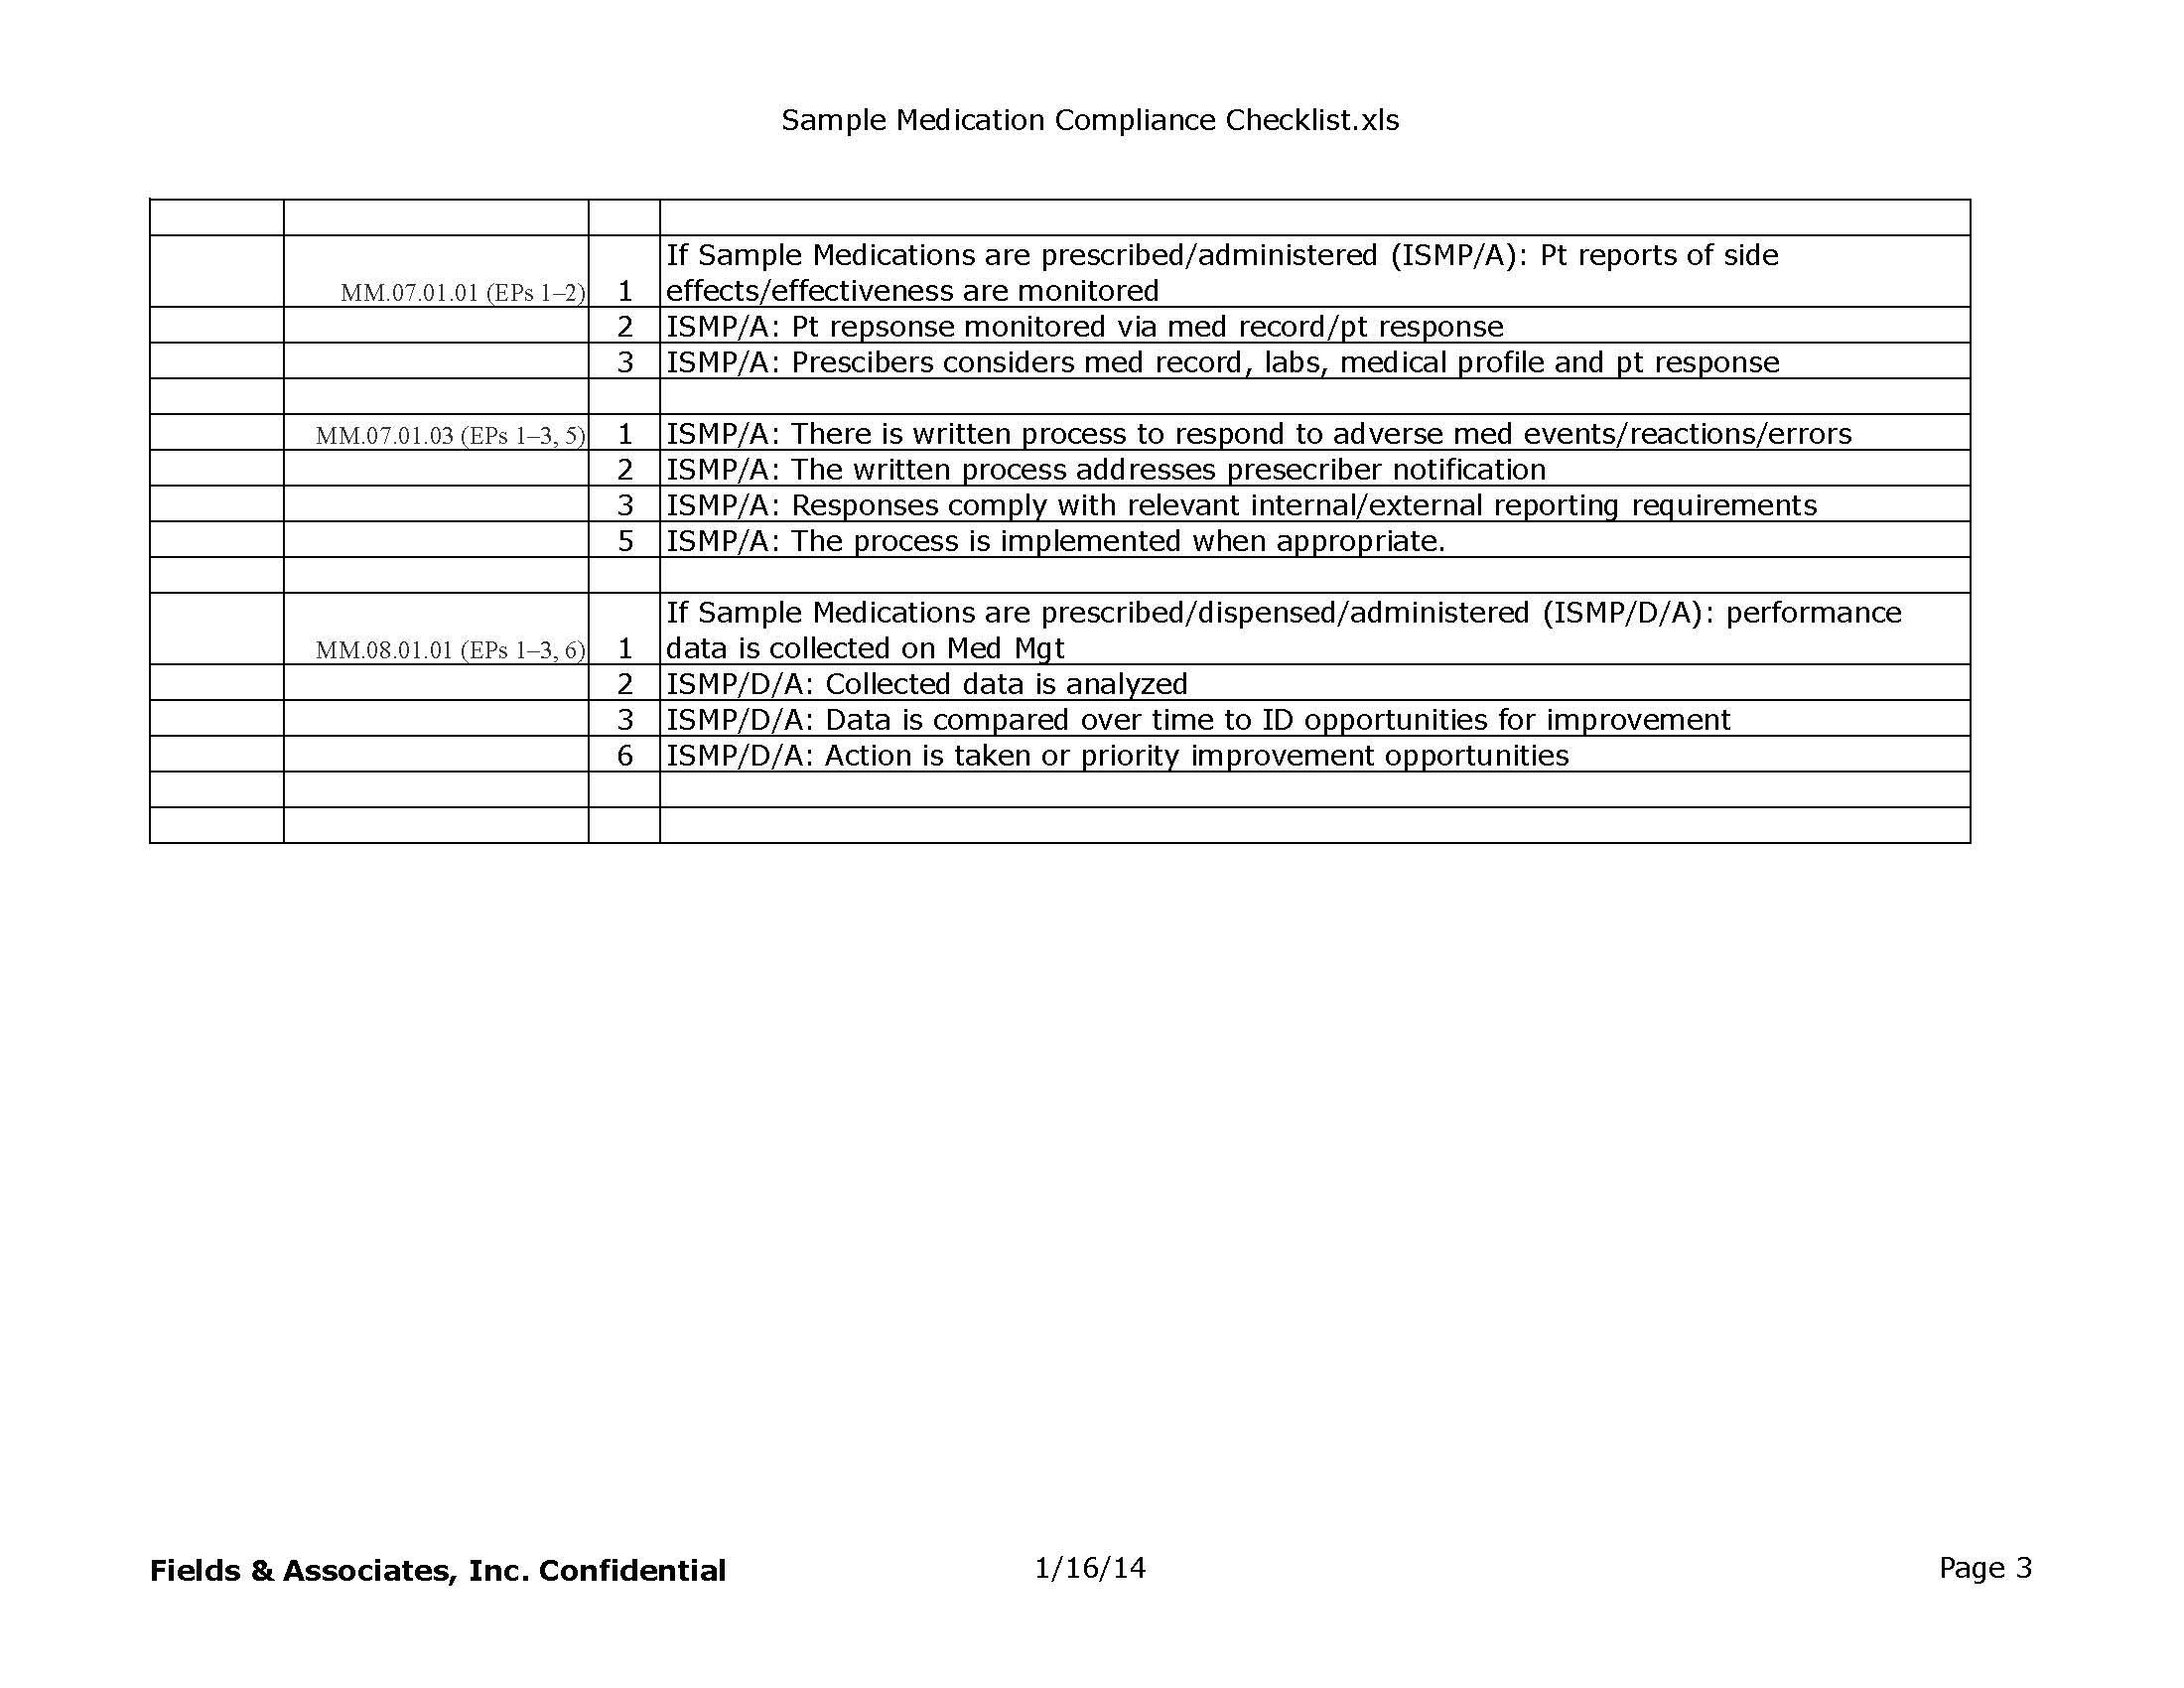 JC_Stnds_MM-Sample Medication Checklist | Fields & Associates, Inc ...